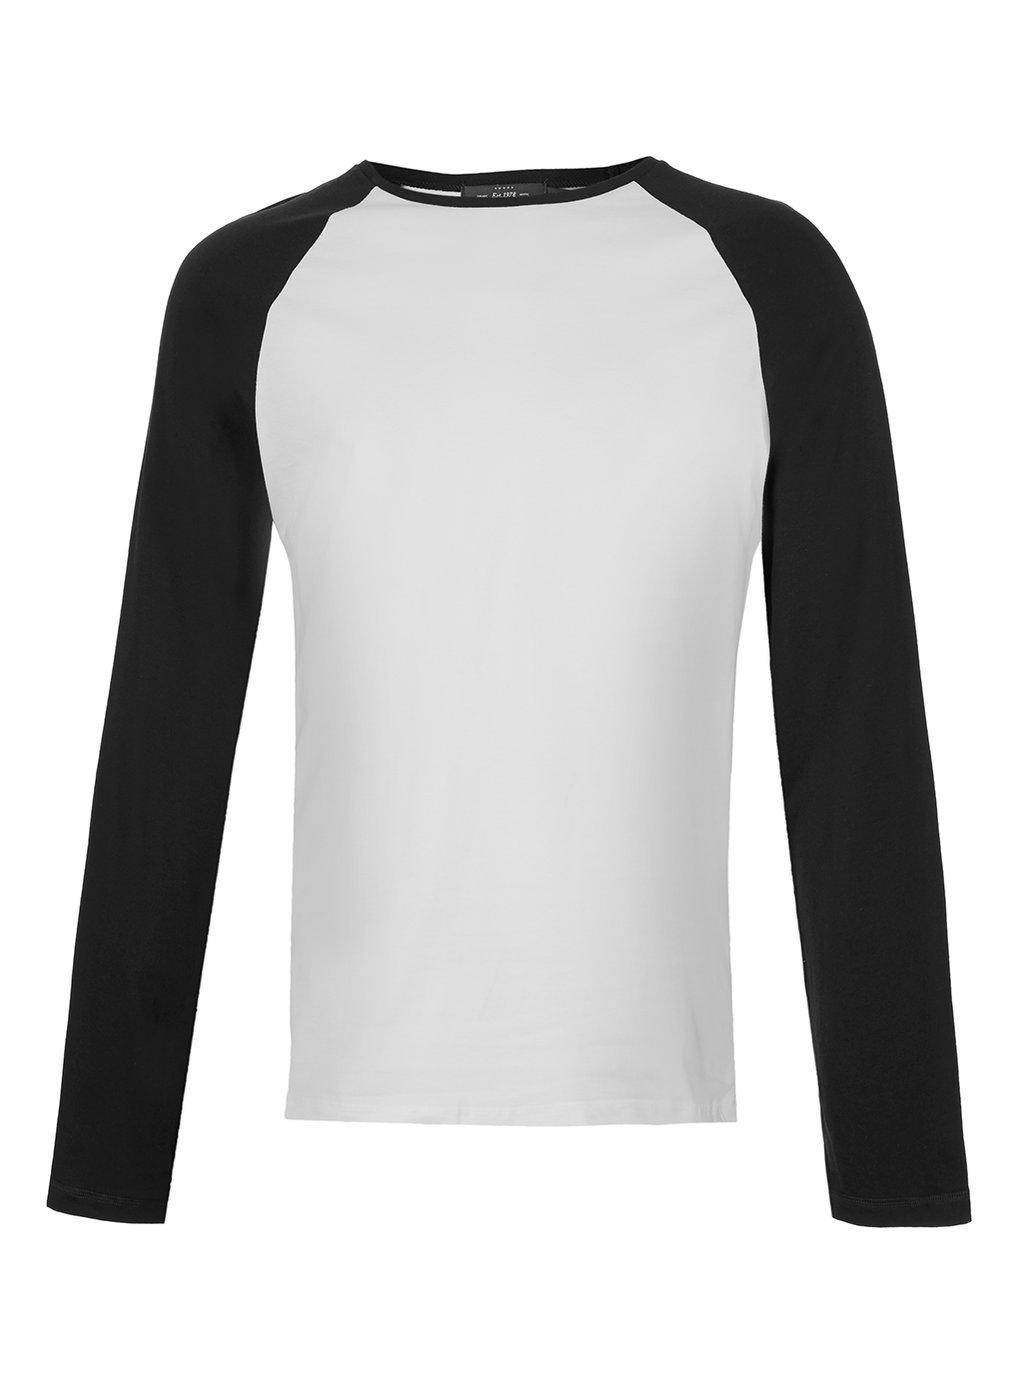 Long Sleeve Black And White Shirt Artee Shirt